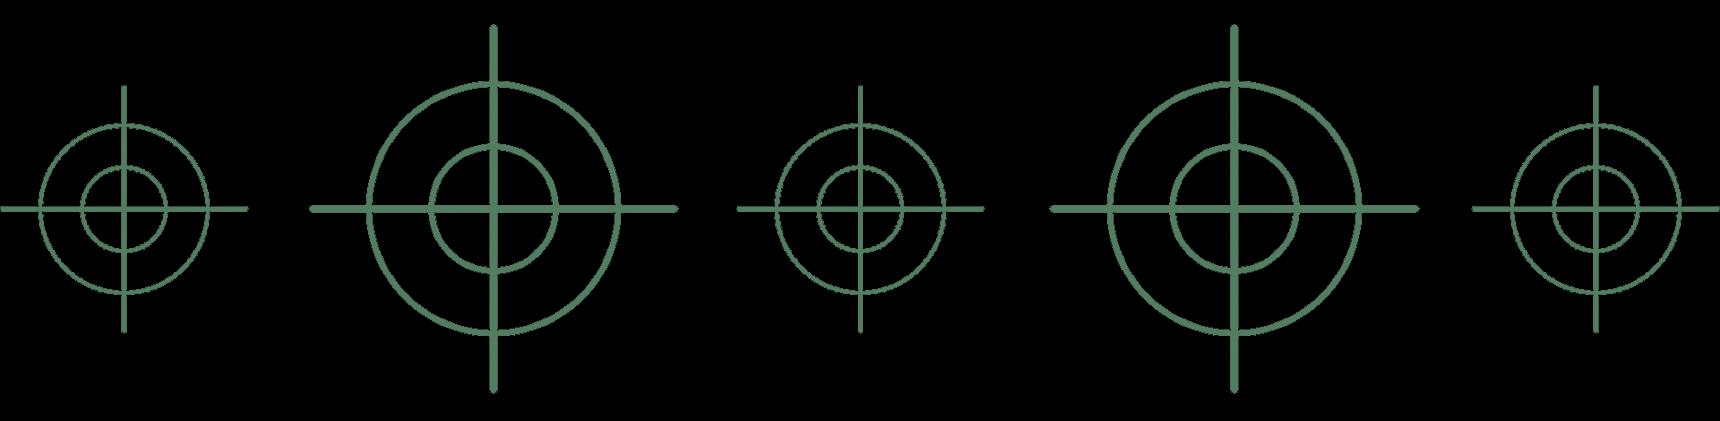 scope crosshairs divider 2